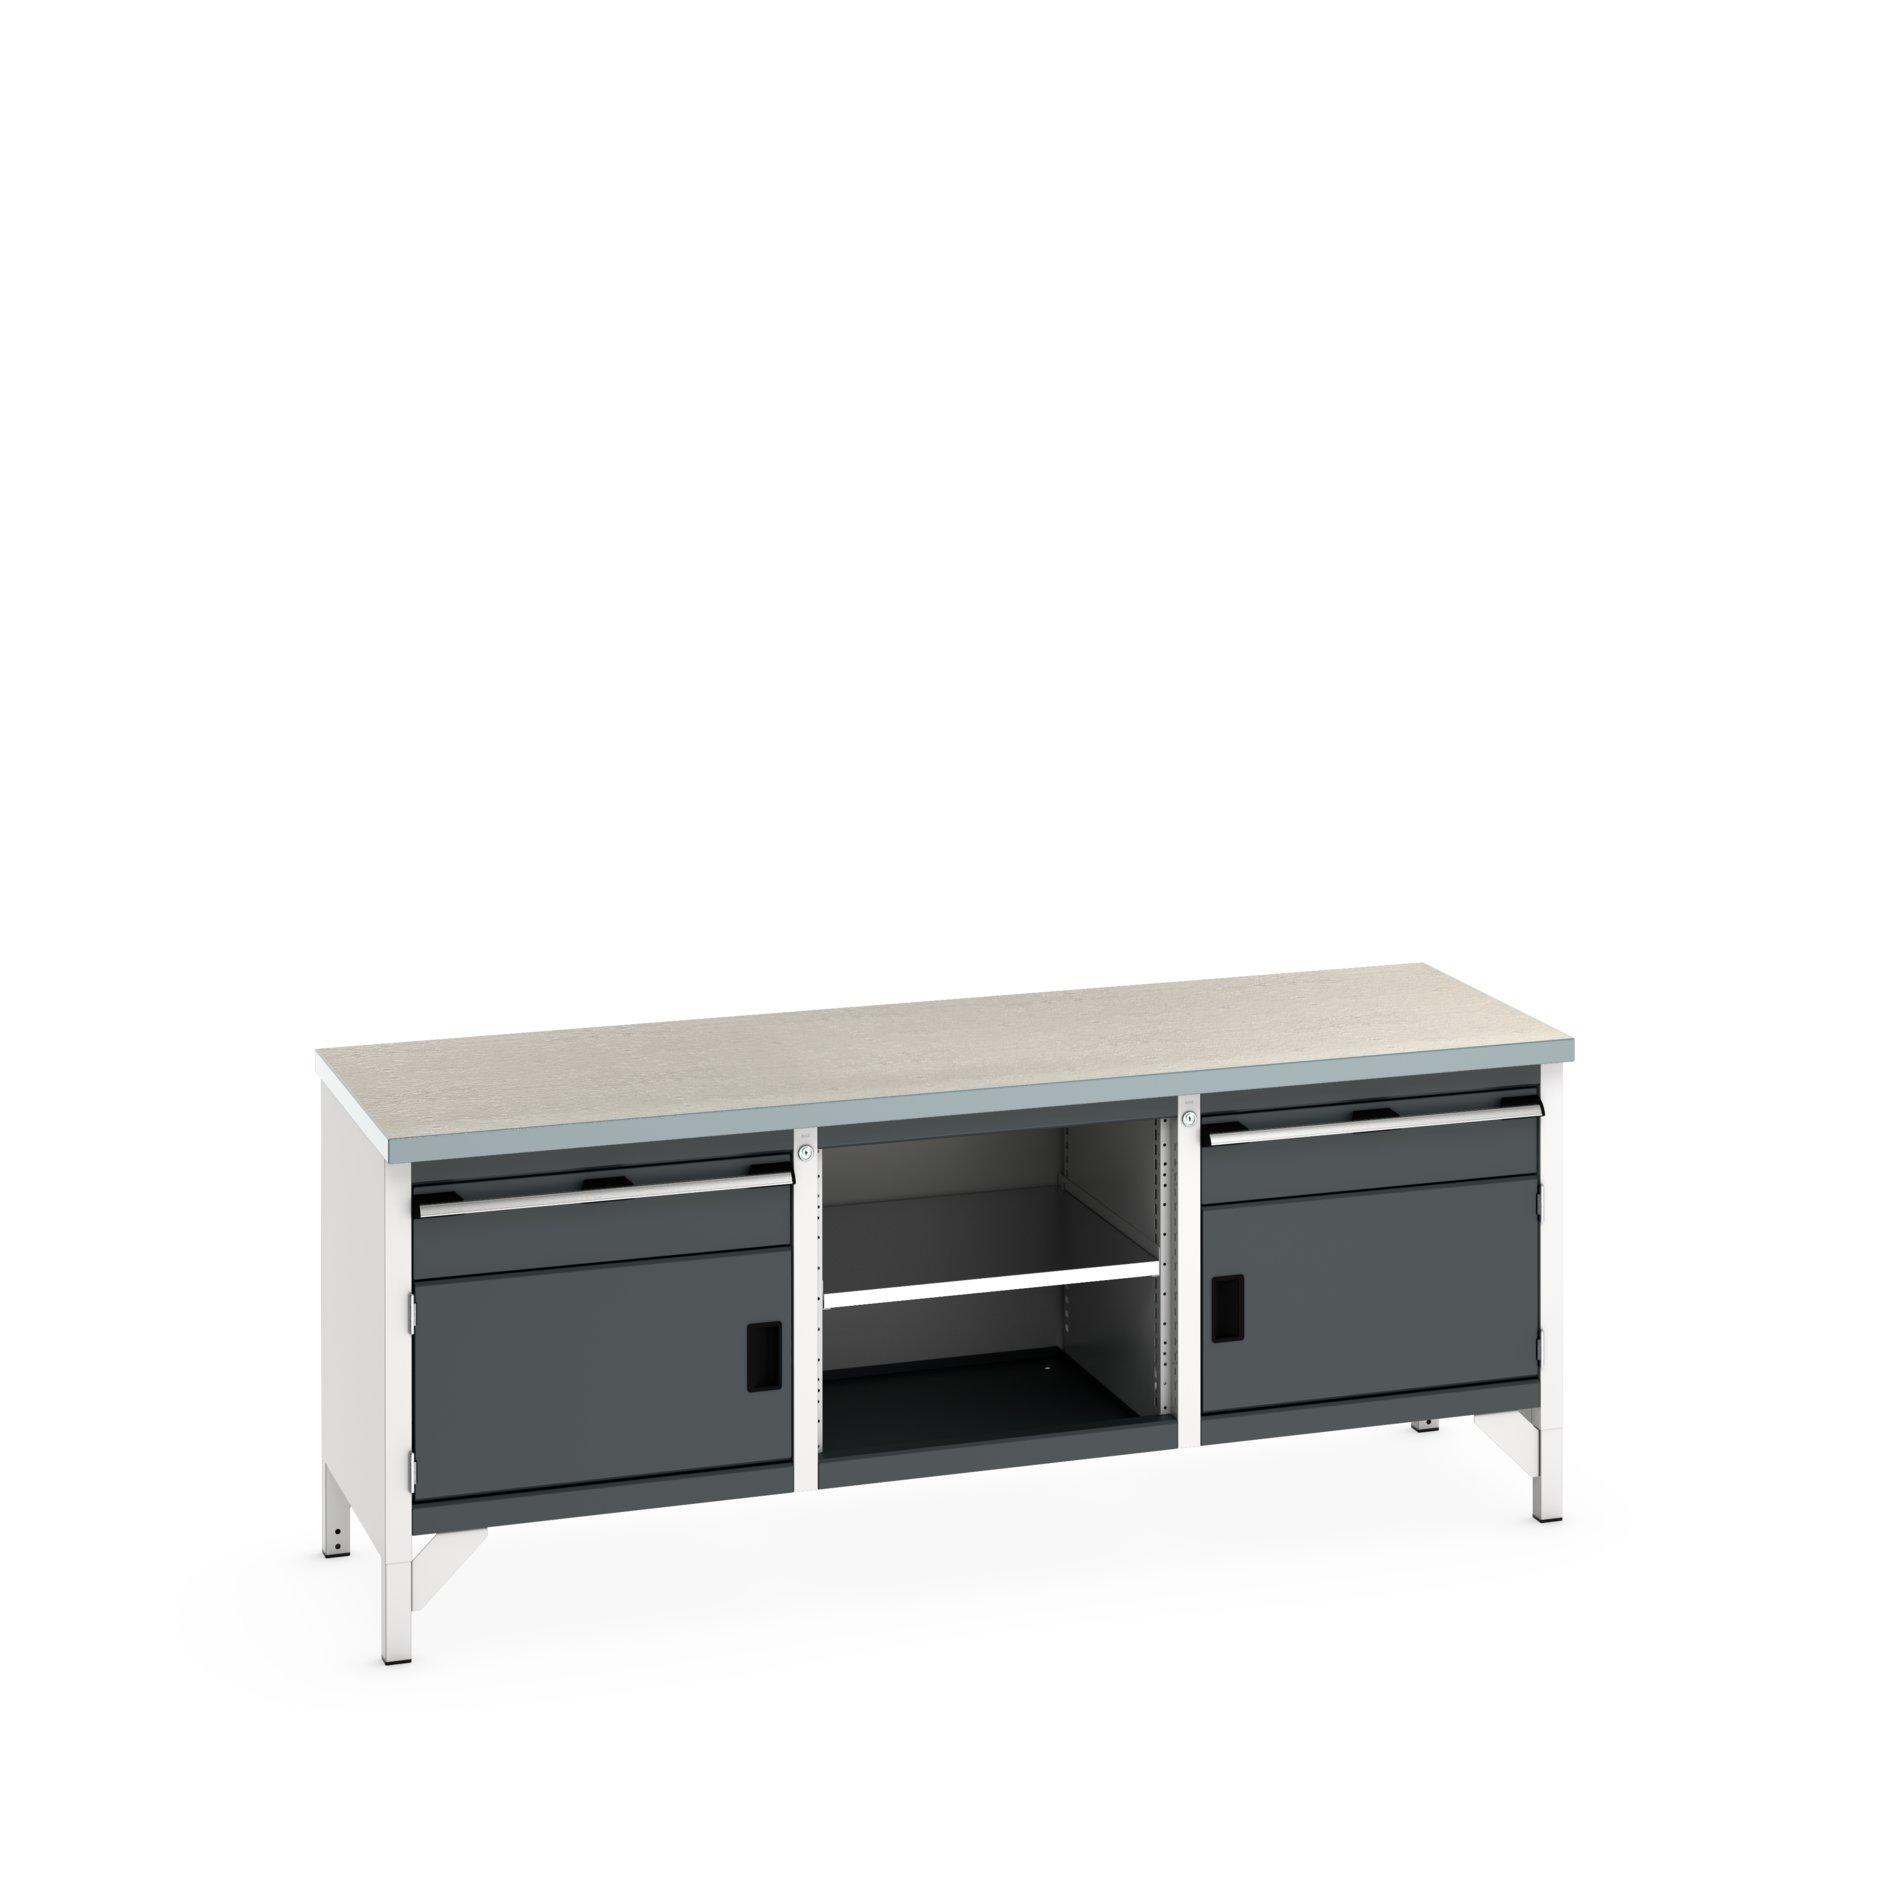 Bott Cubio Storage Bench With 1 Drawer-Door Cabinet / Open Cupboard / 1 Drawer-Door Cabinet